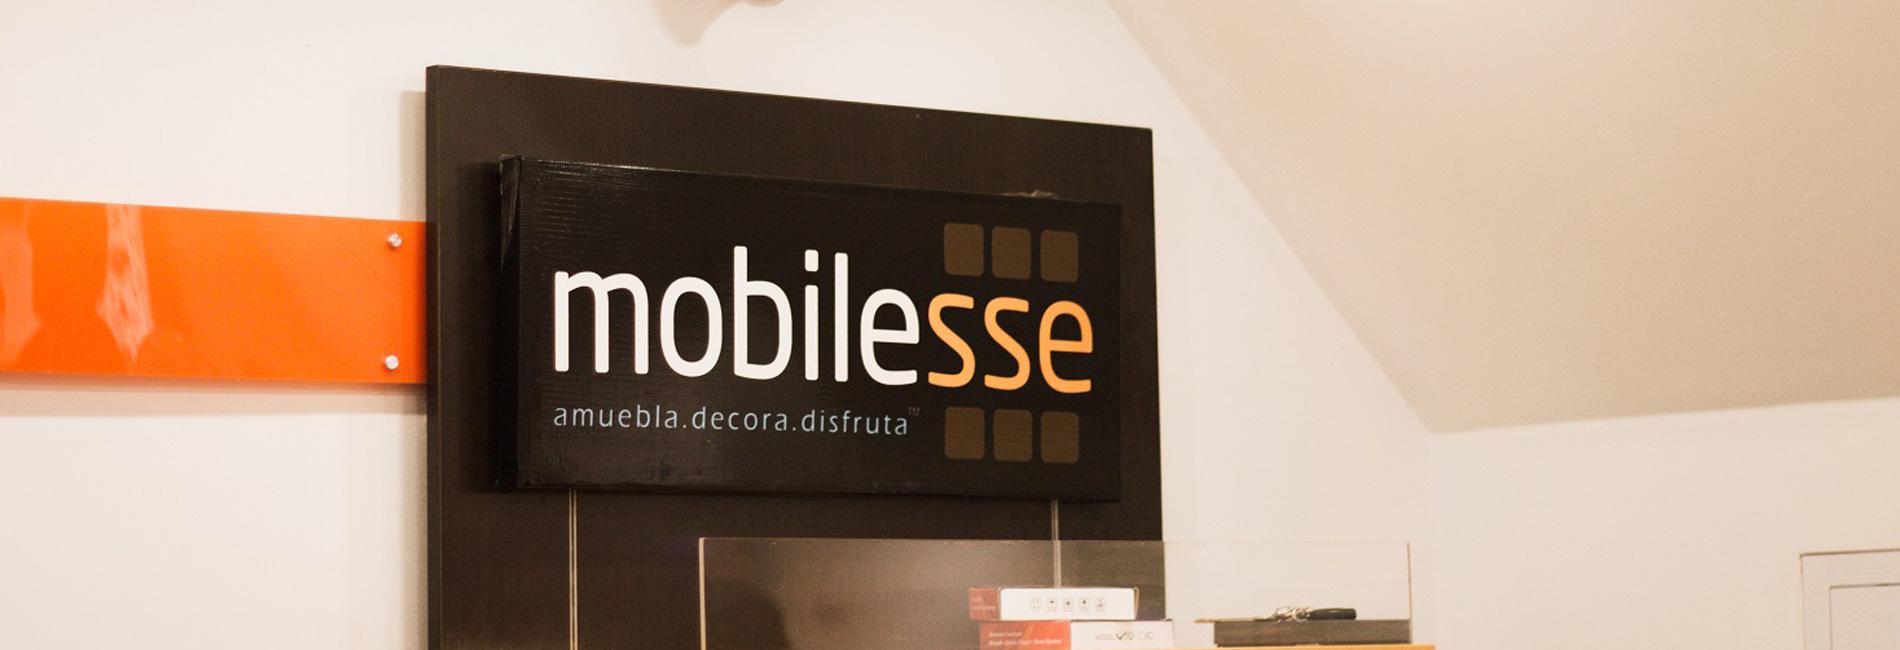 «Bienvenidos al futuro» con Mobilesse